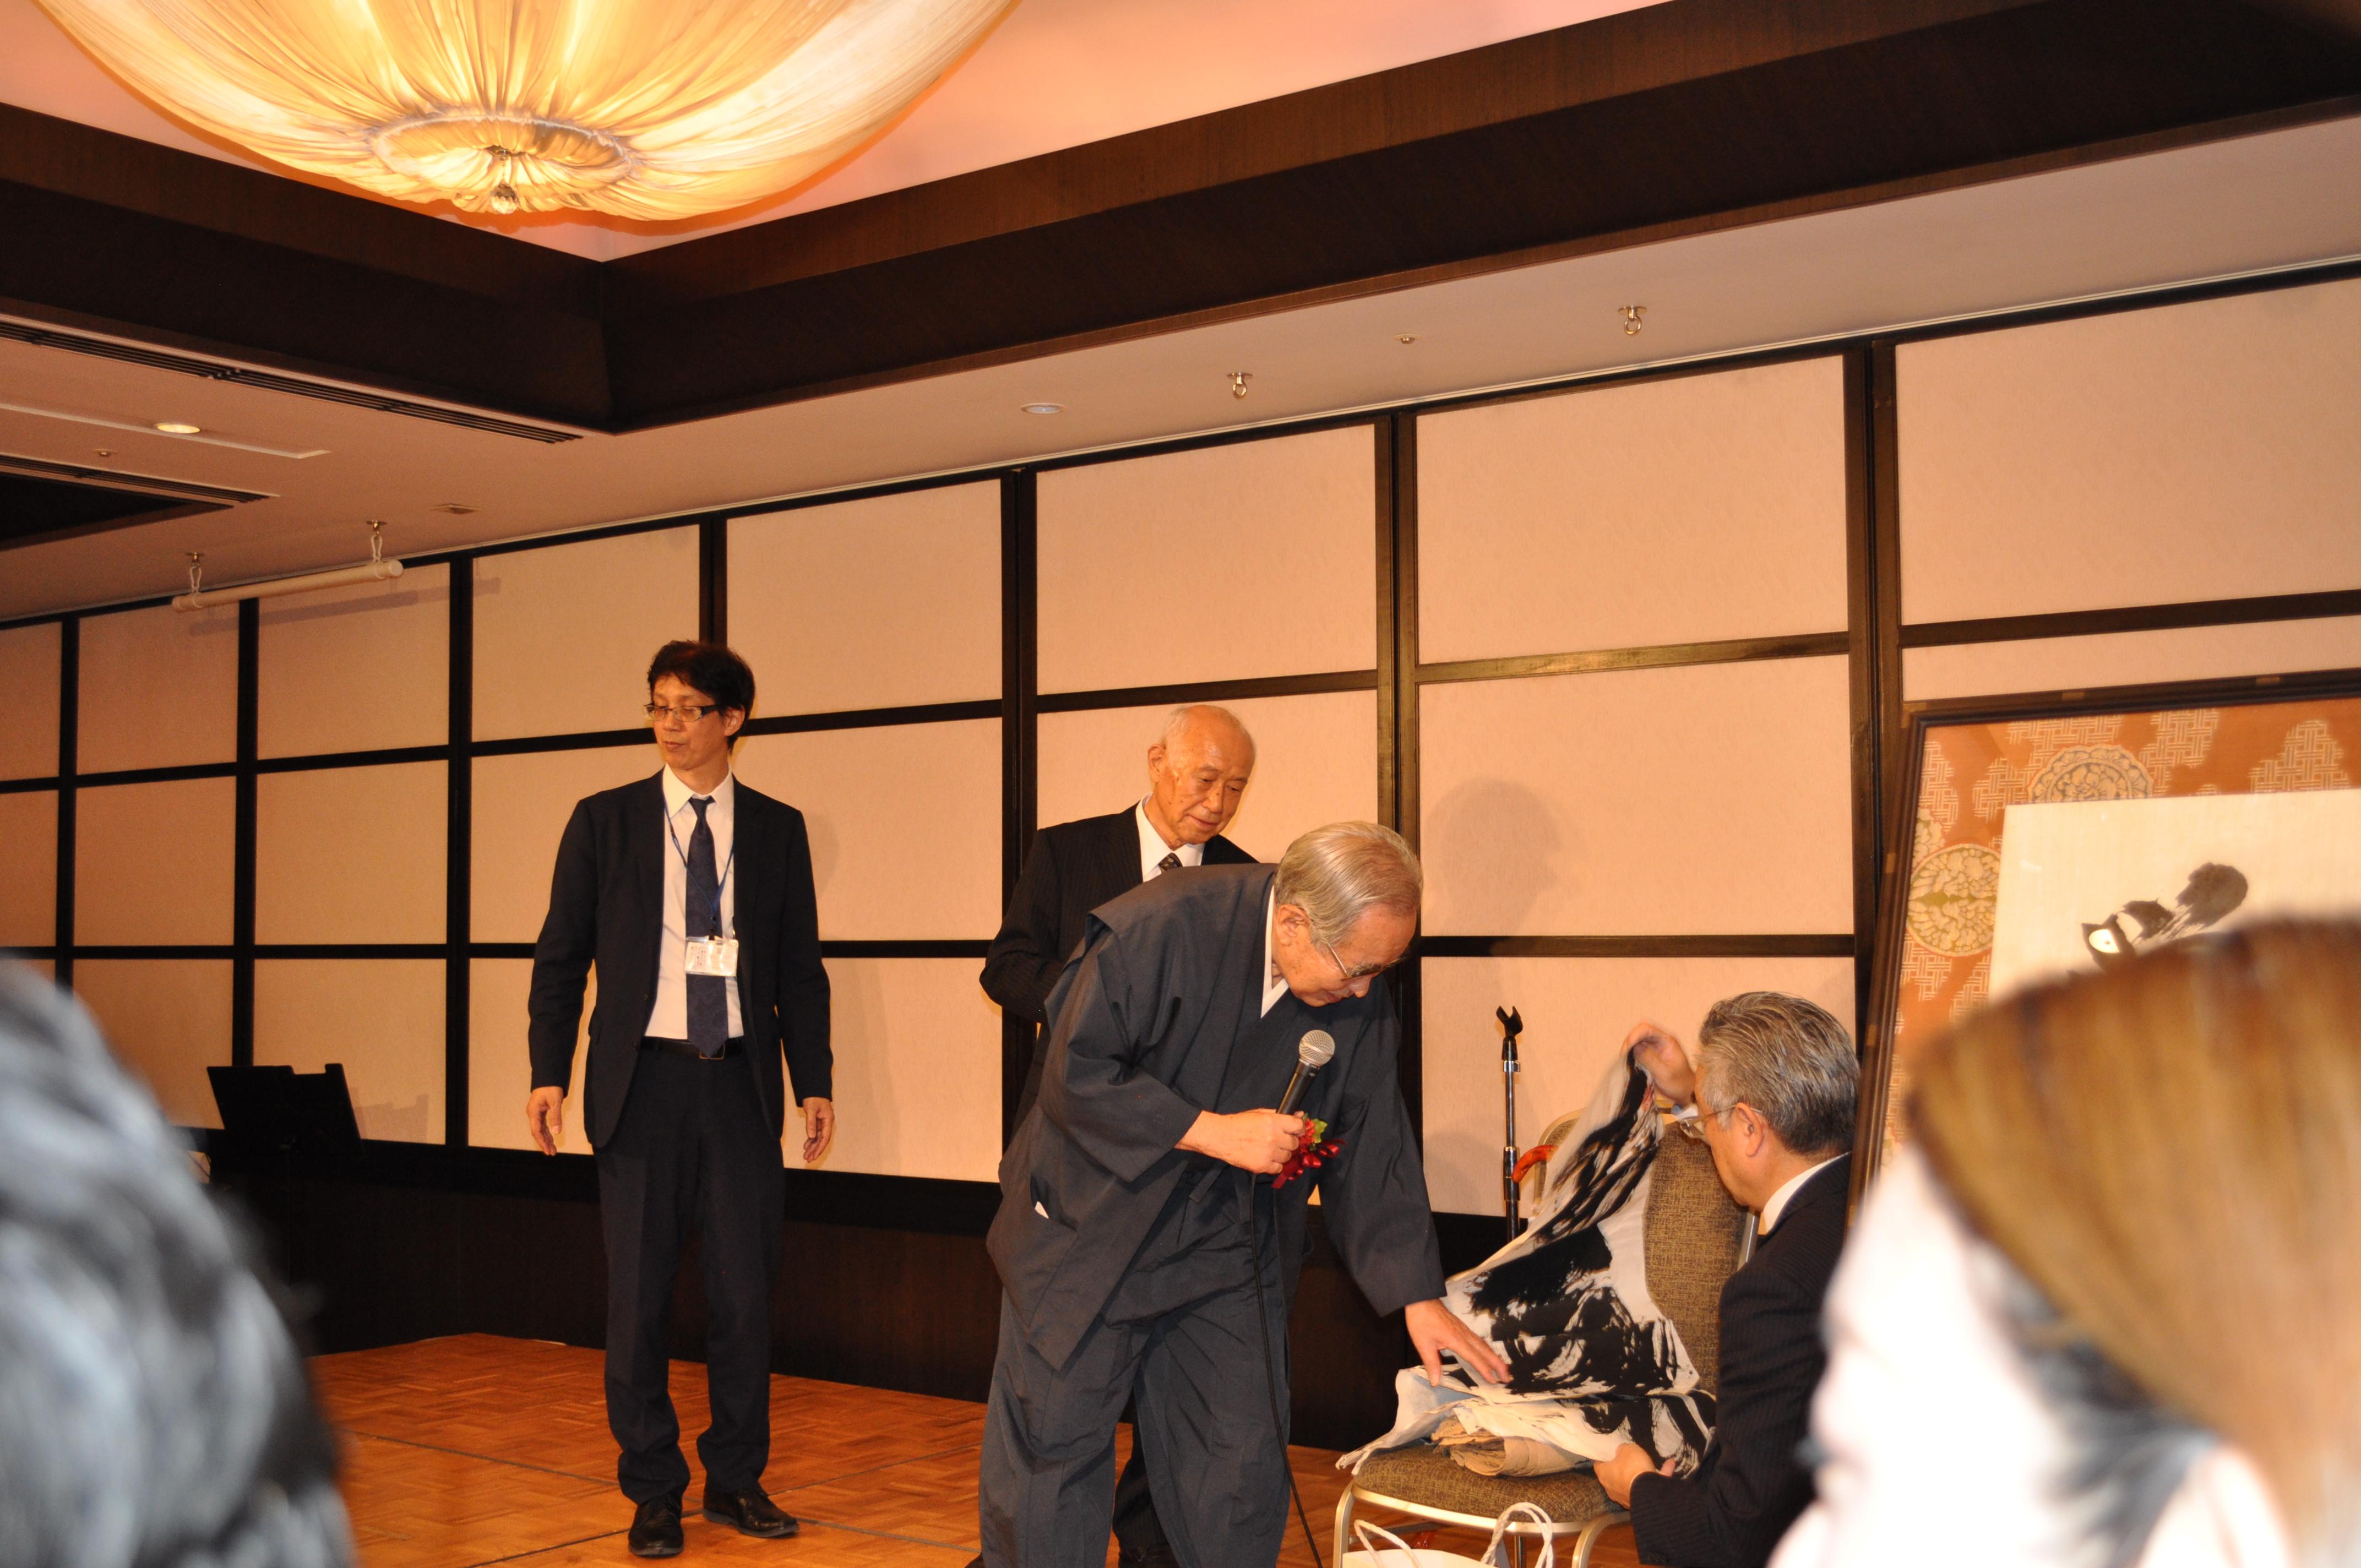 DSC 0537 - 第6回思風会全国大会2018in東京開催